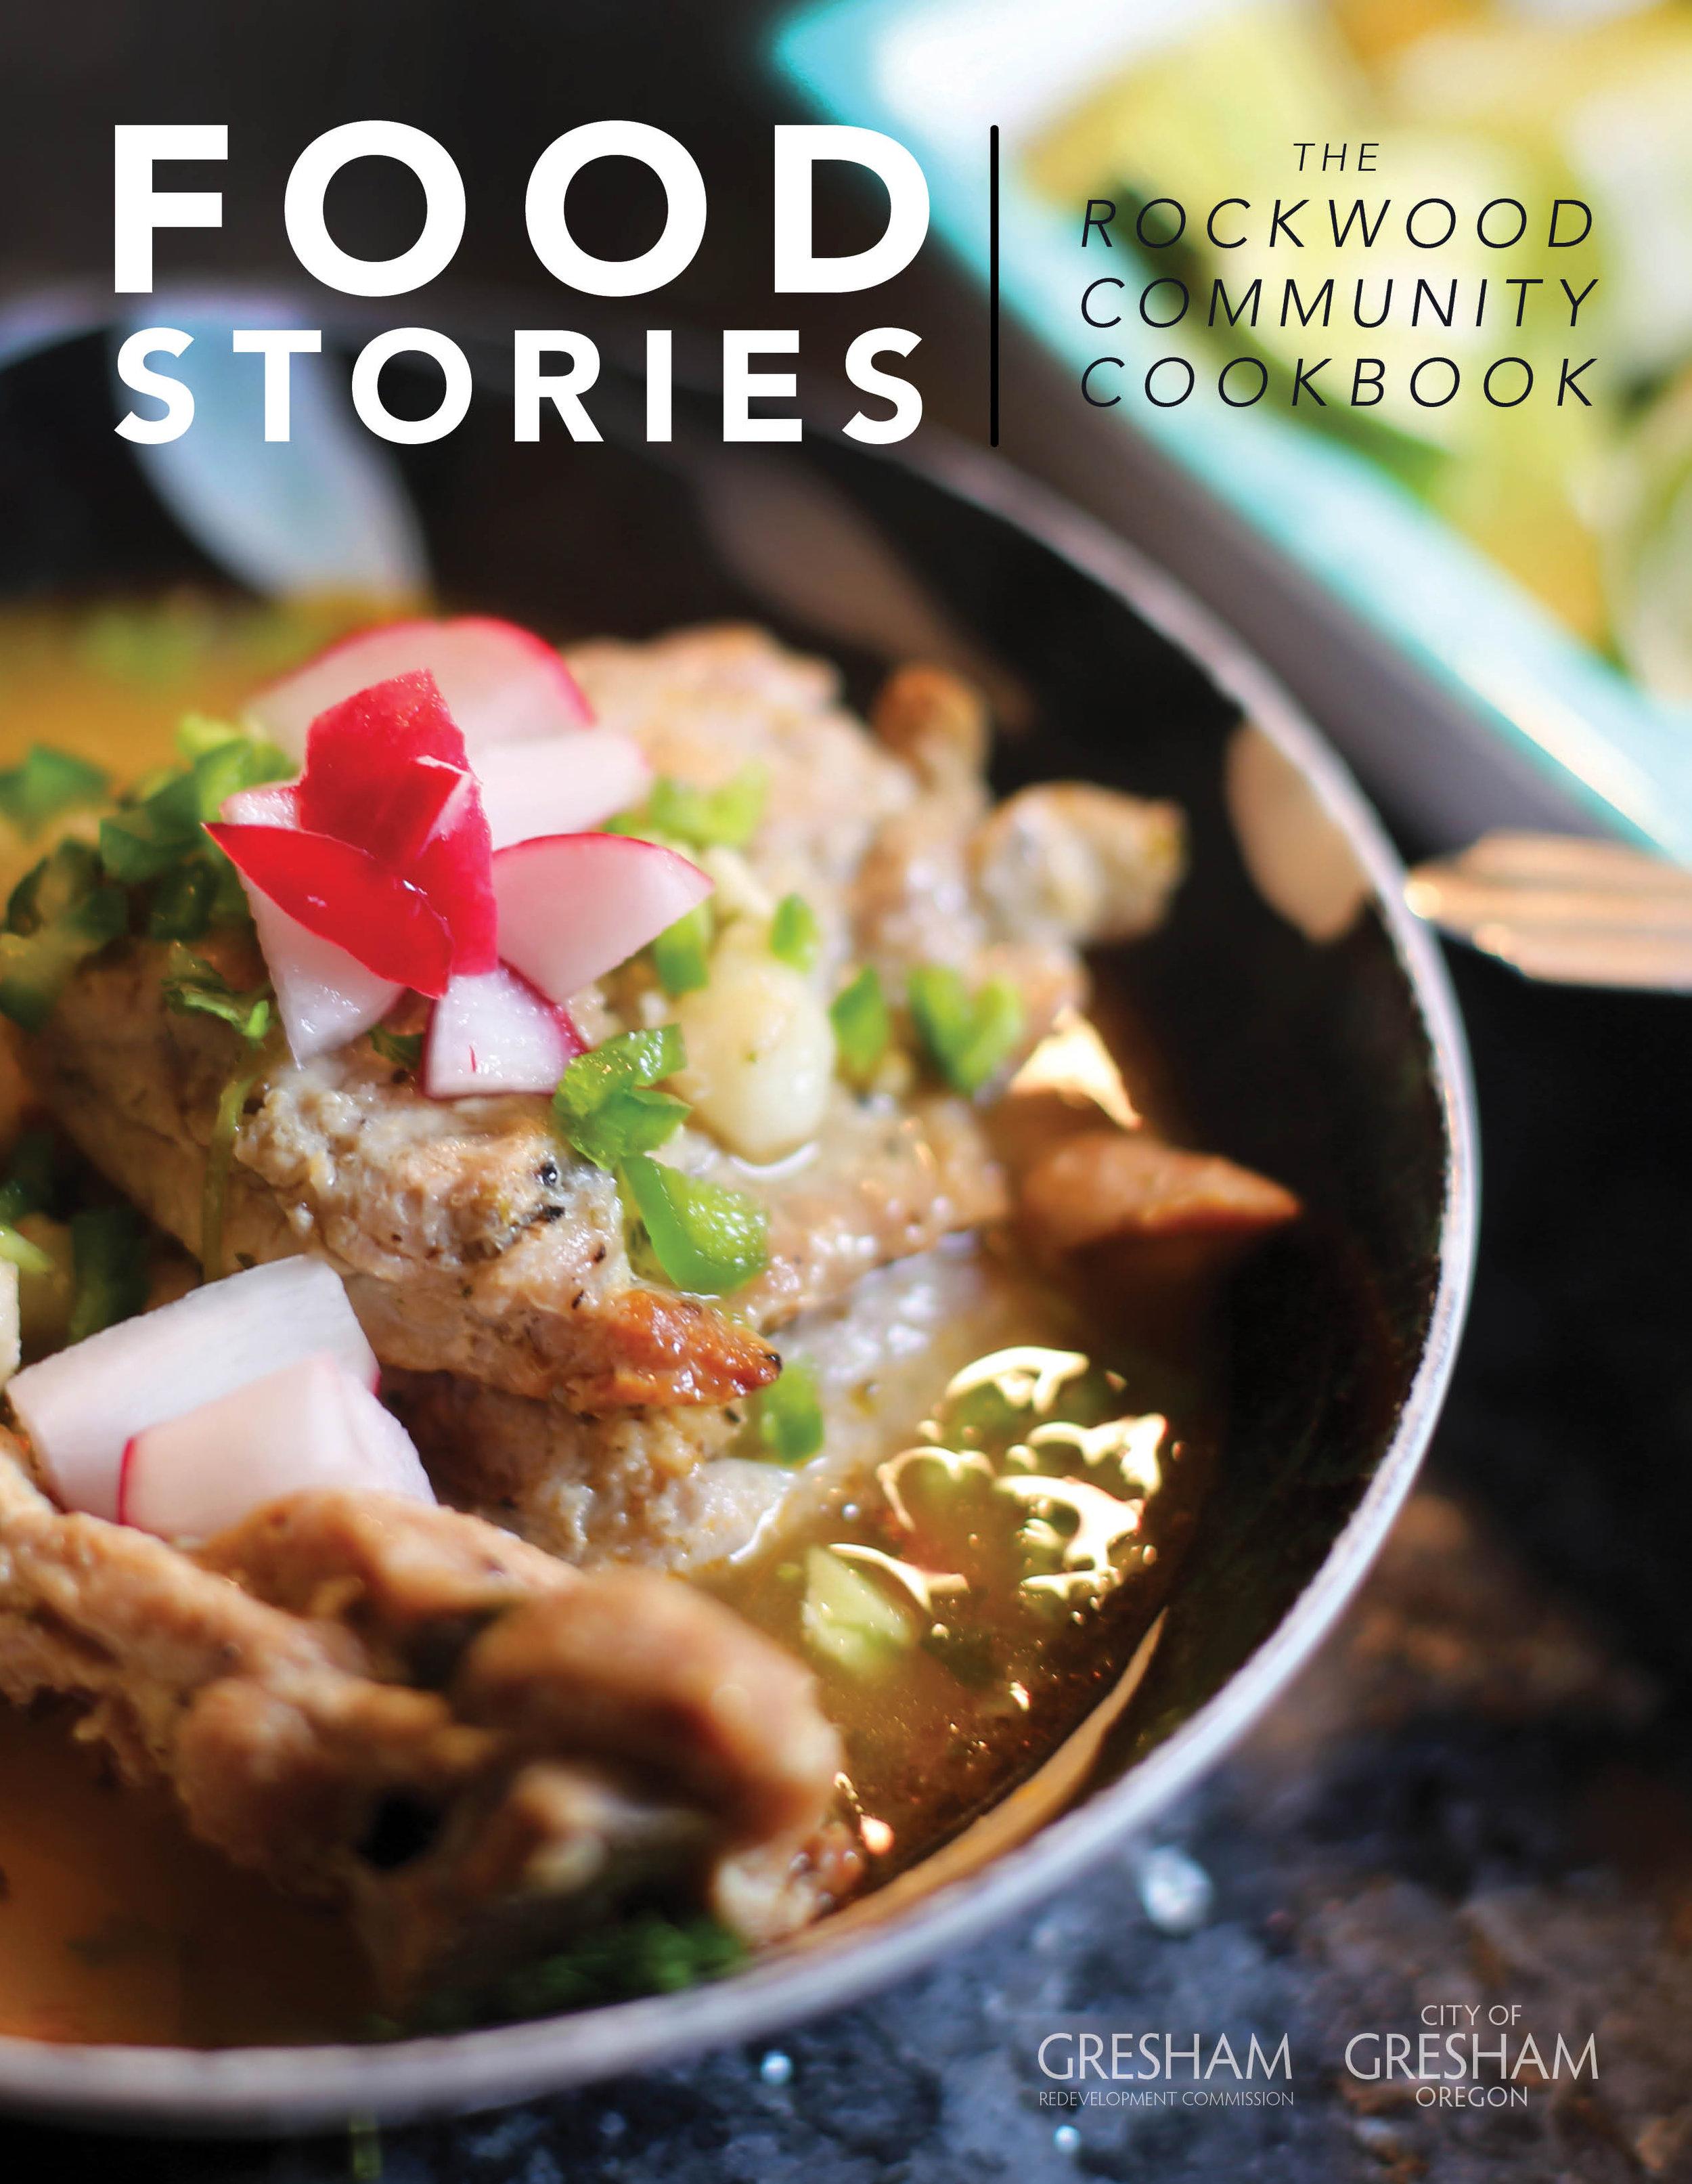 Rockwood Community Cookbook.jpg